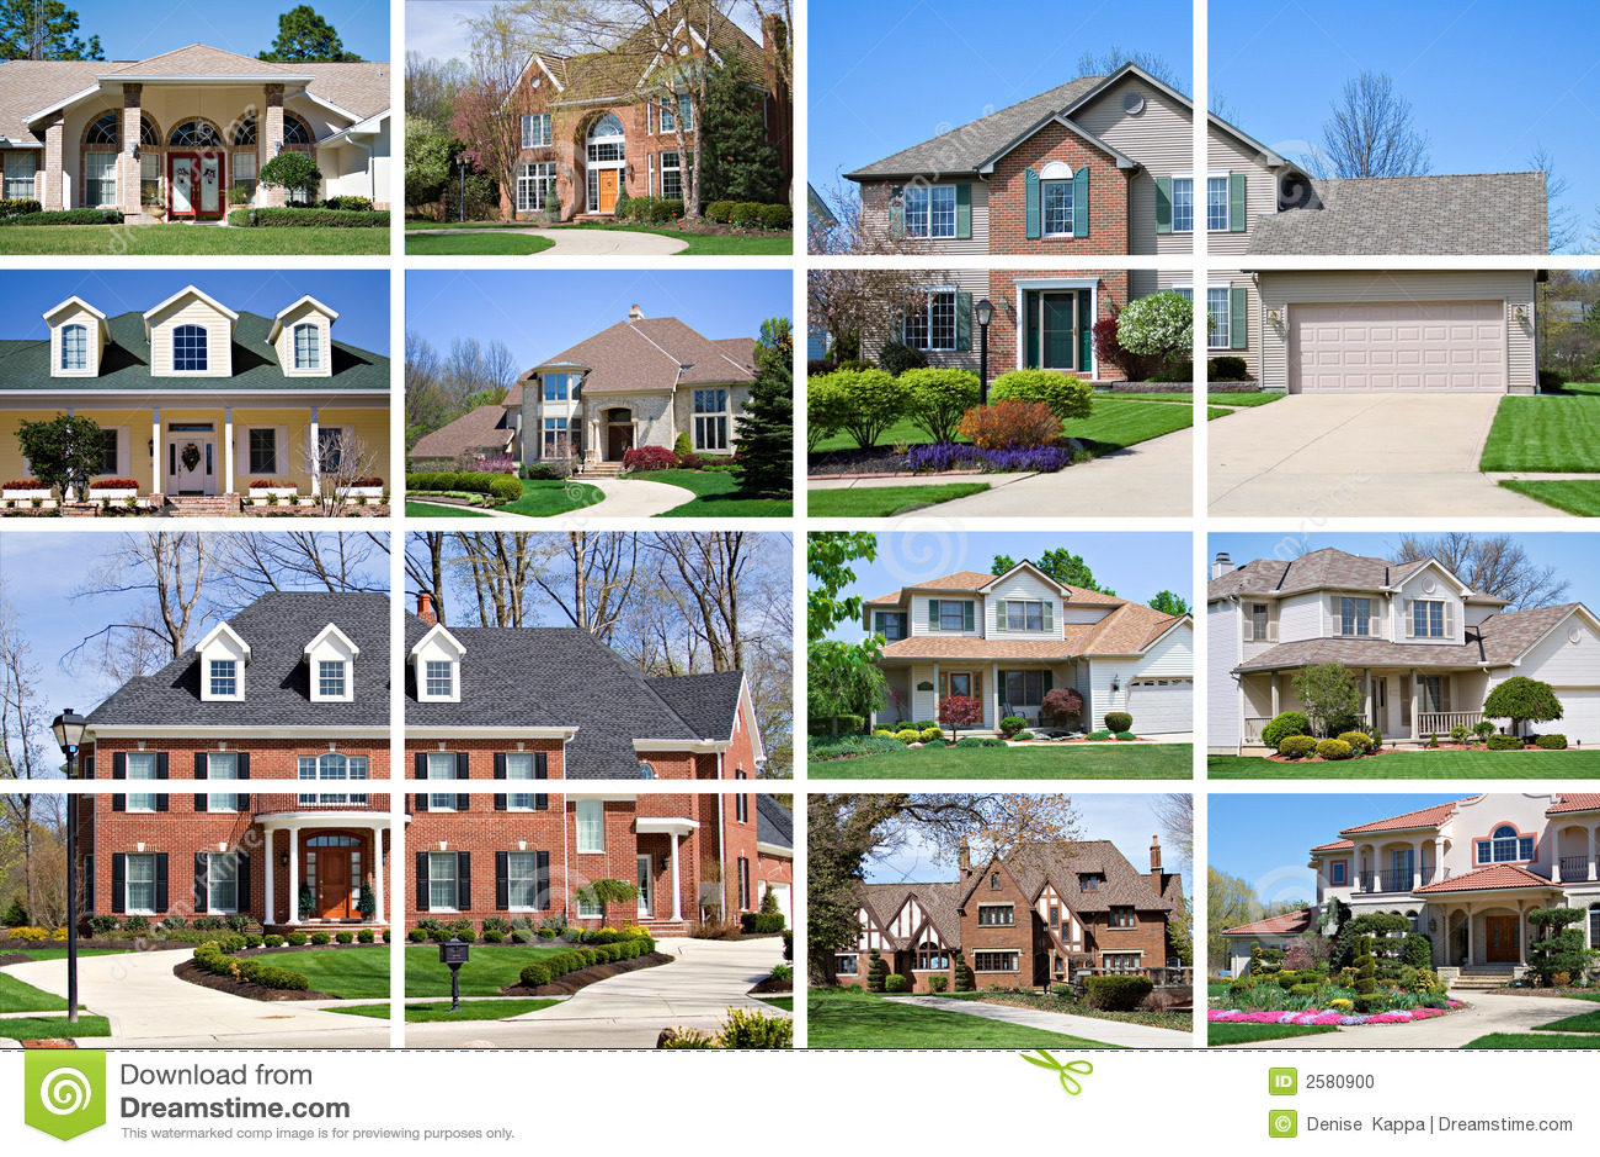 House Collage Stock Photo Image 2580900